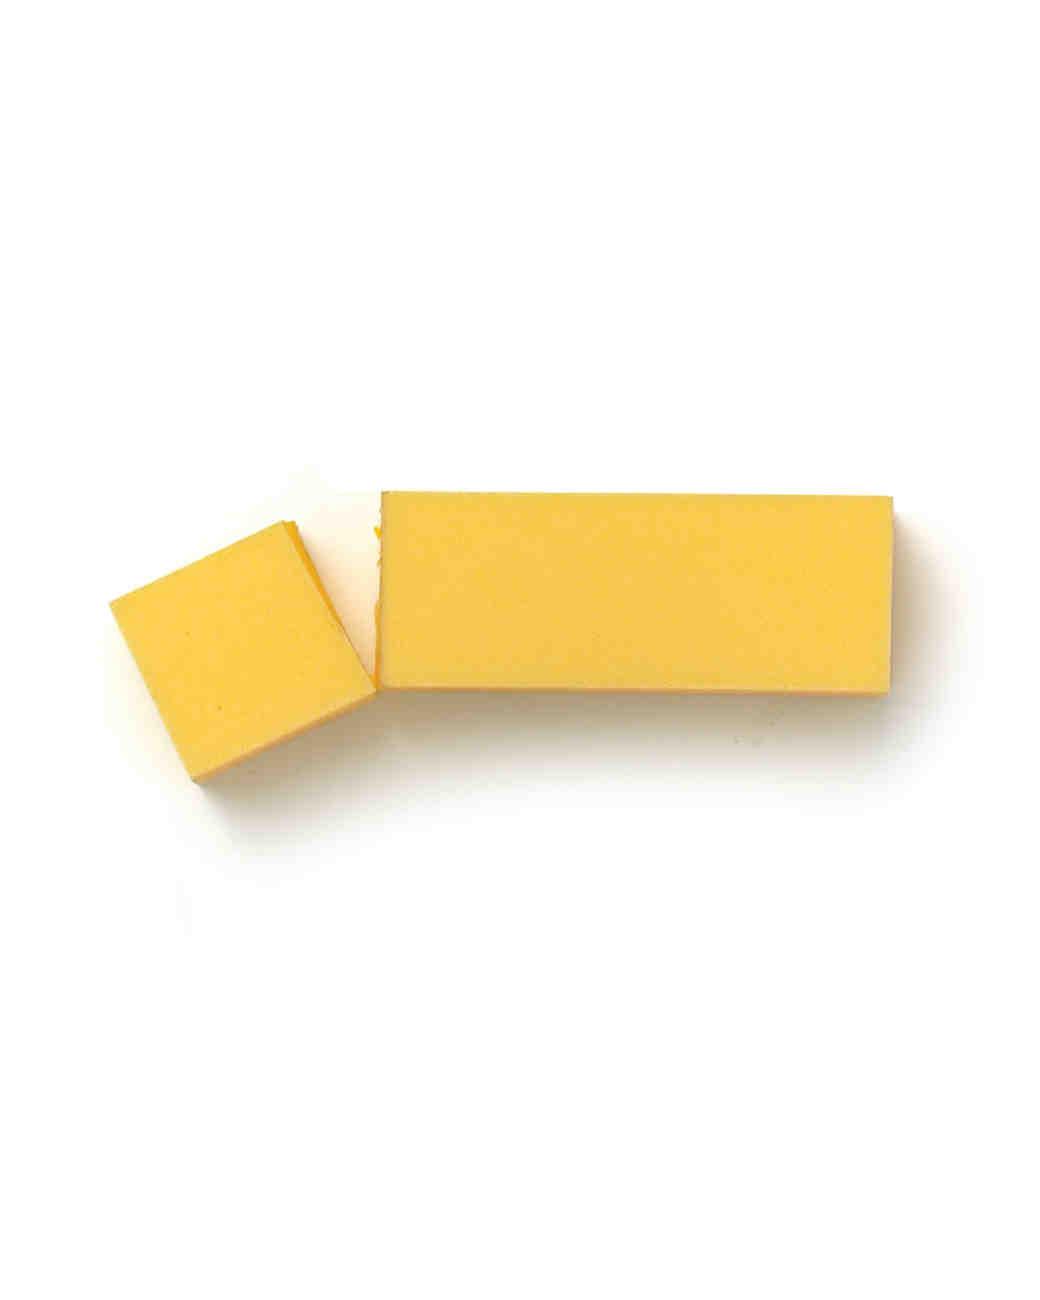 all-seasons-fine-grit-yellow-finishing-block-mwd109646.jpg